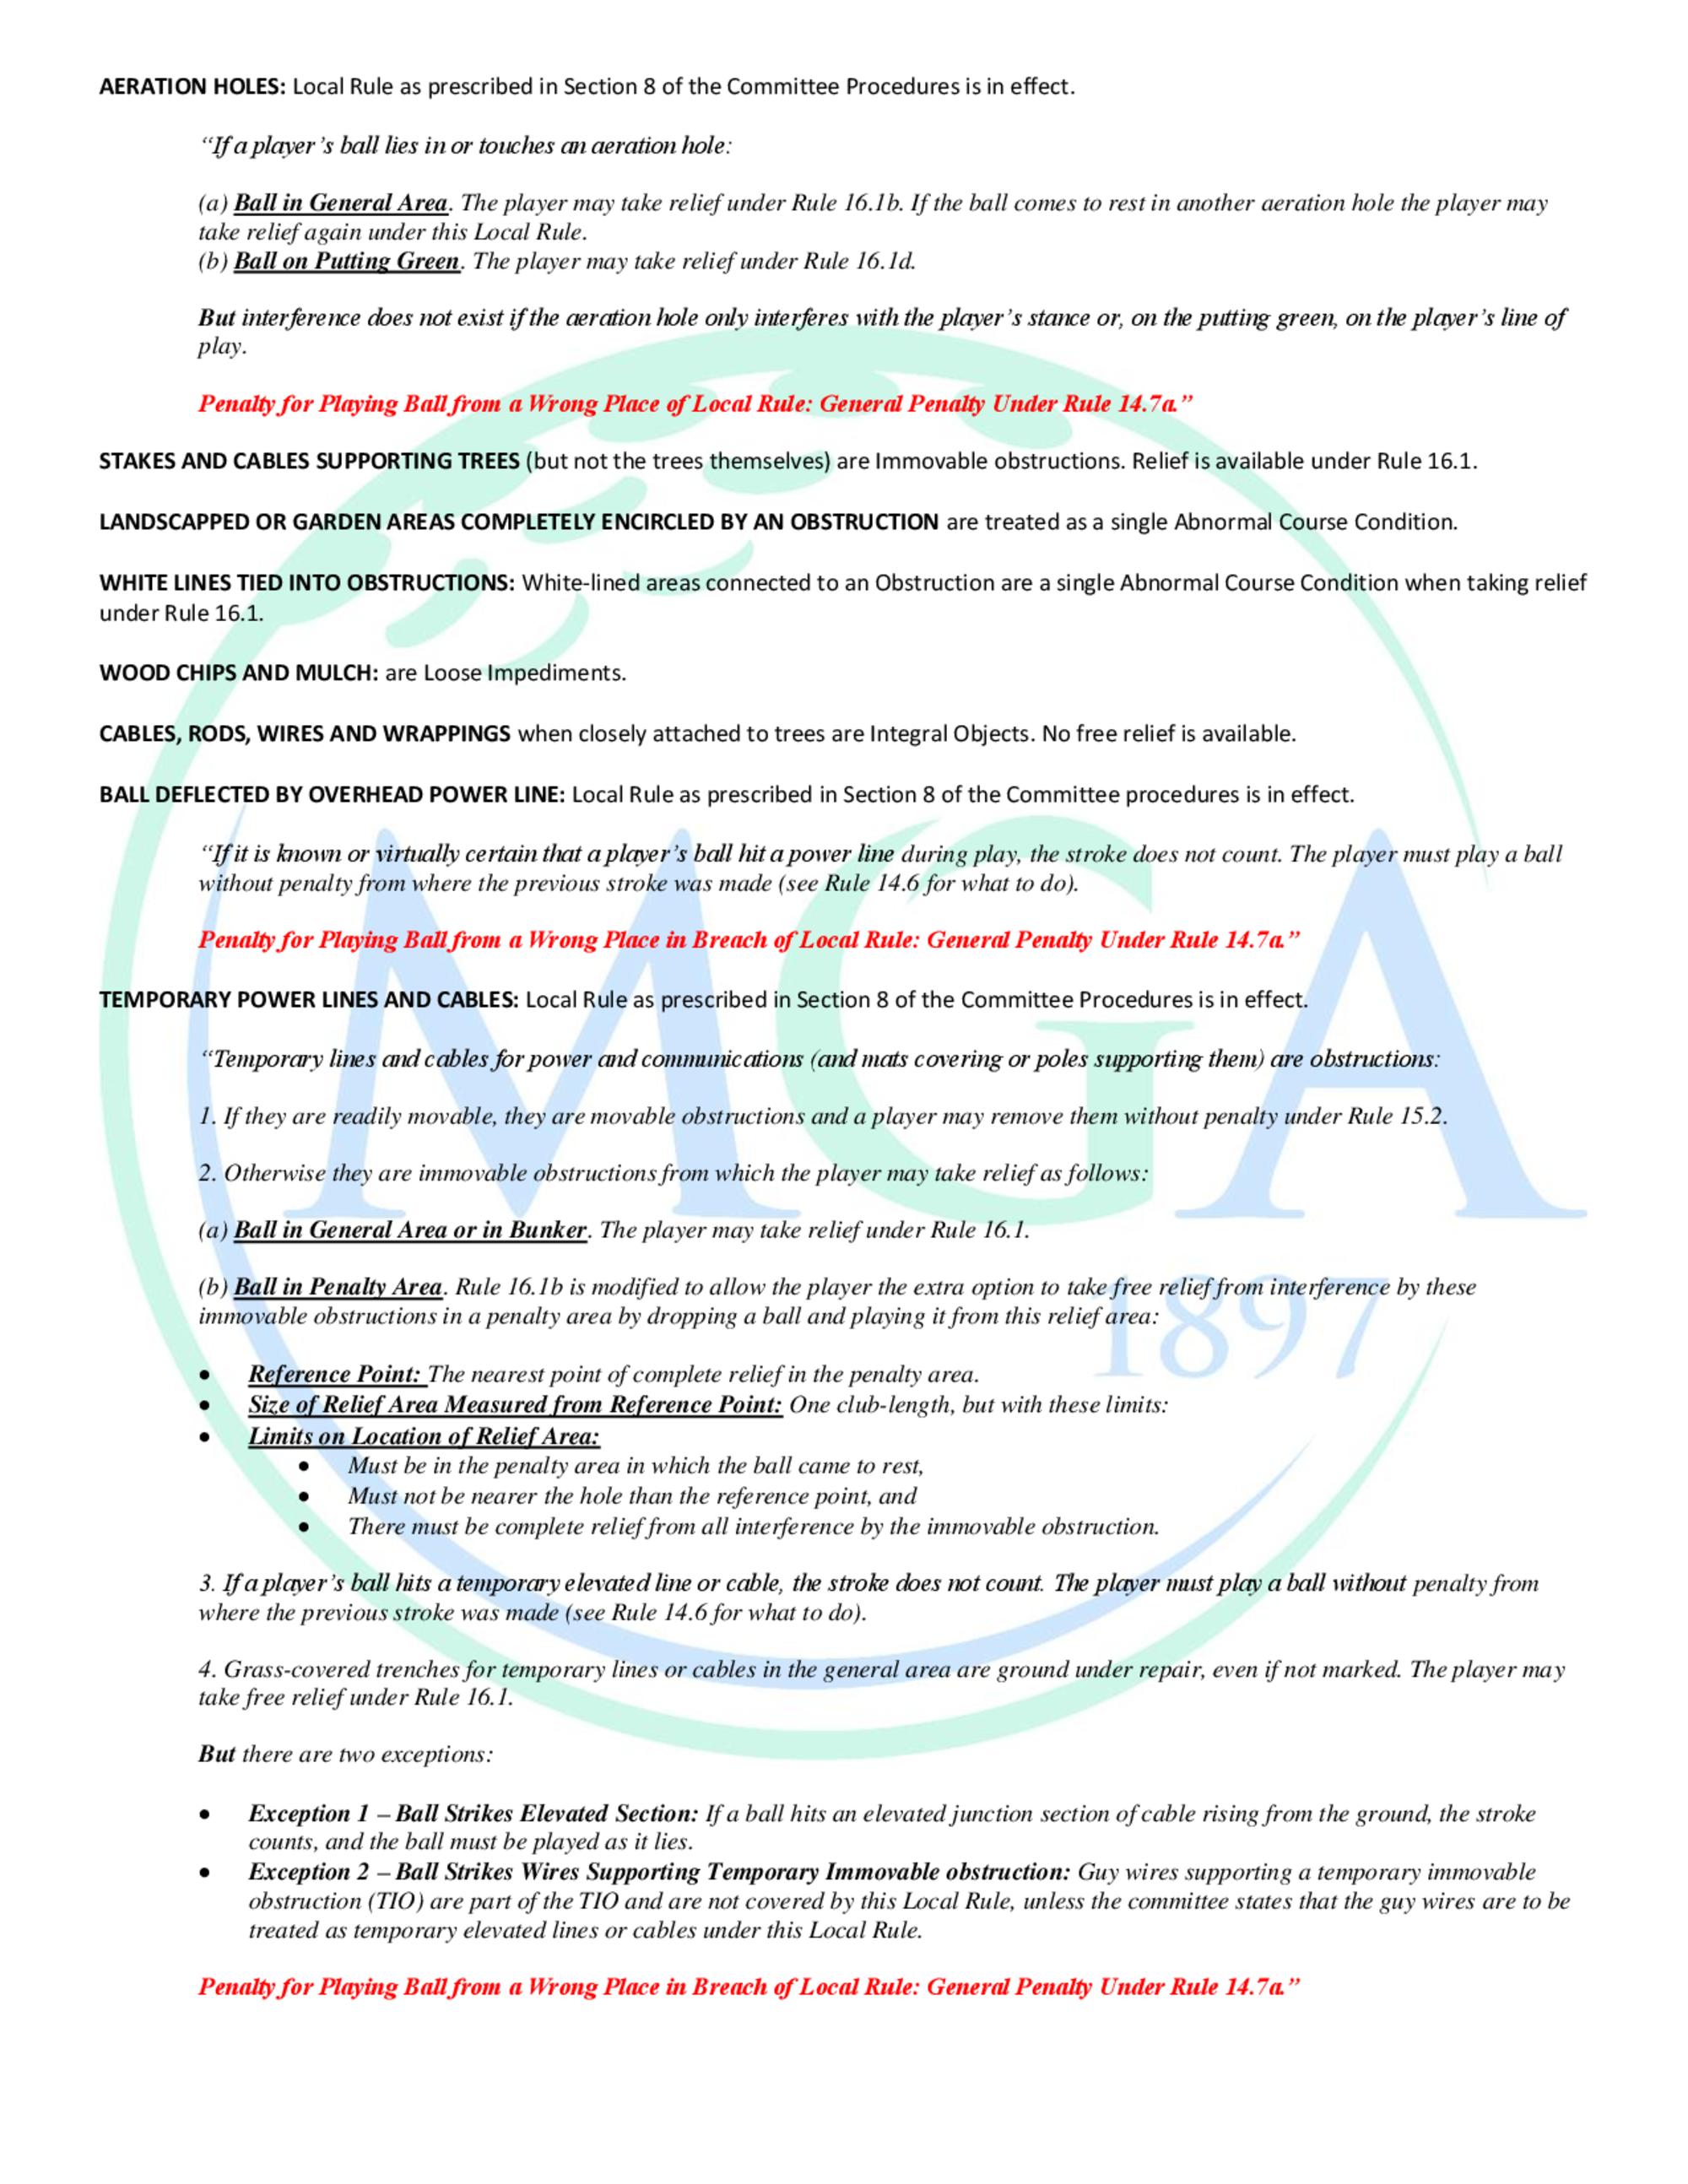 Mga hard card supplement document  2